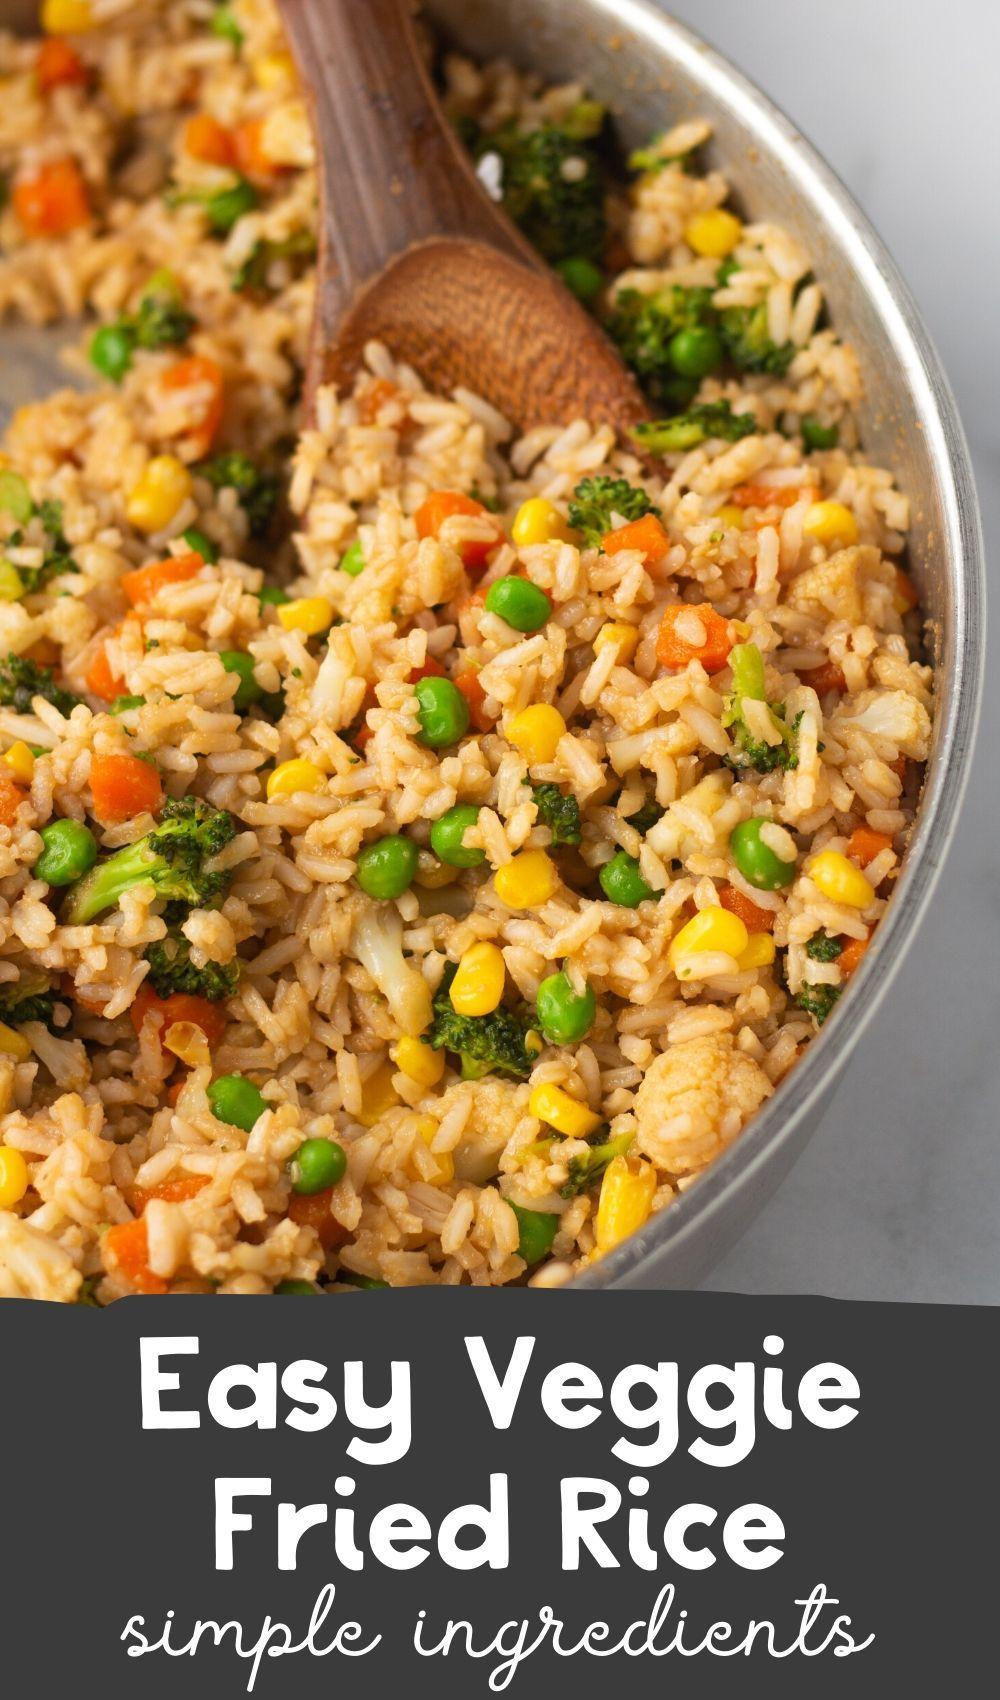 Easy Vegetable Fried Rice Karissa S Vegan Kitchen Recipe In 2020 Vegan Dinner Recipes Rice Recipes Vegan Veggie Fried Rice